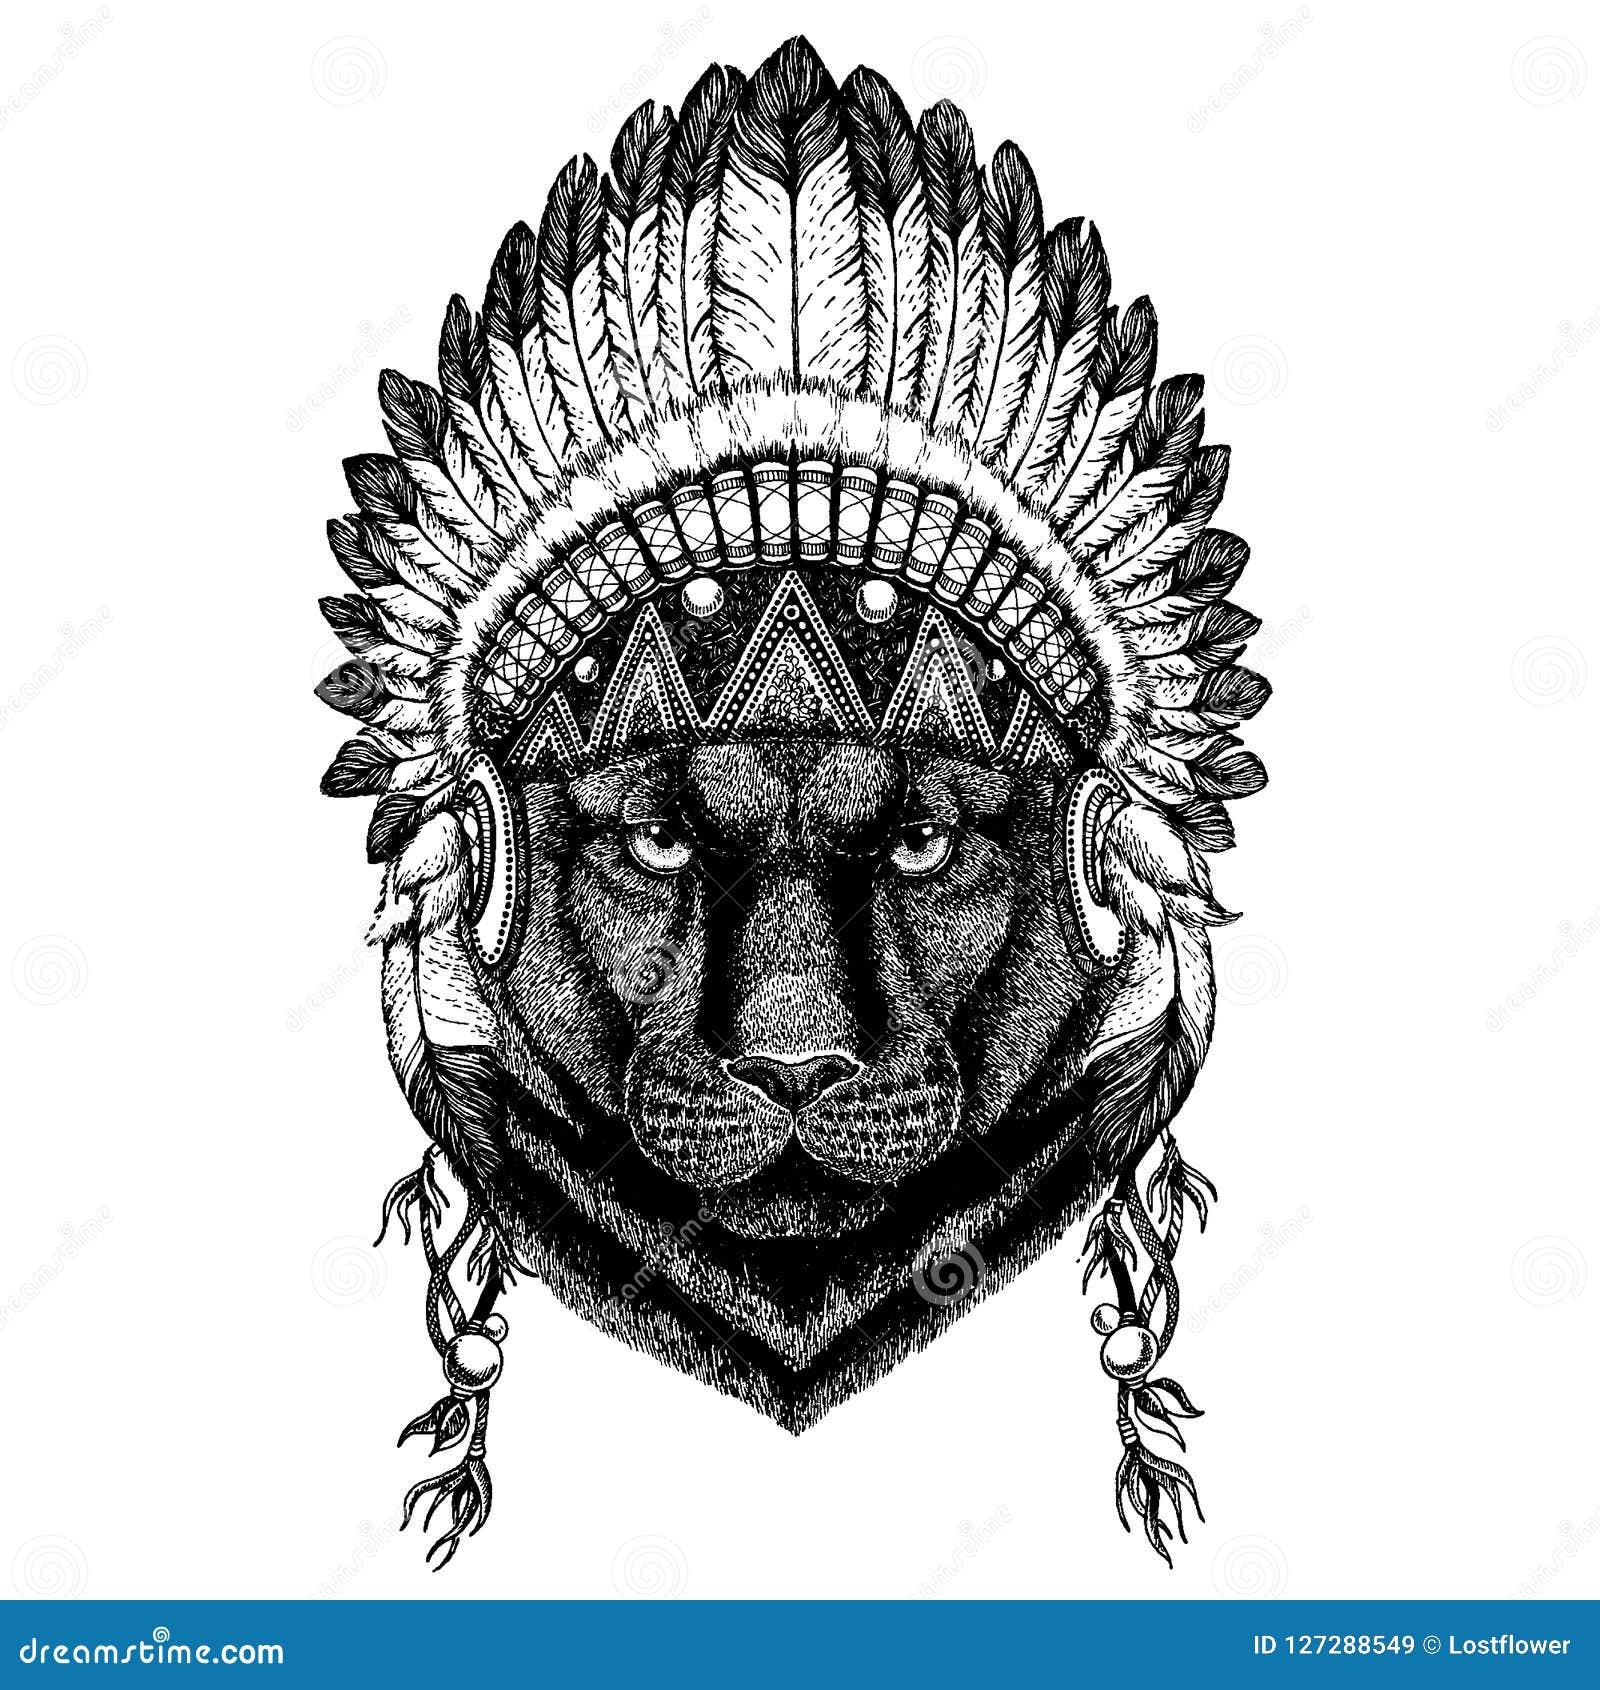 Black Panther Wild Animal Wearing Inidan Headdress With Feathers Boho Chic Style Illustration For Tattoo Emblem Stock Vector Illustration Of Children Jaguar 127288549